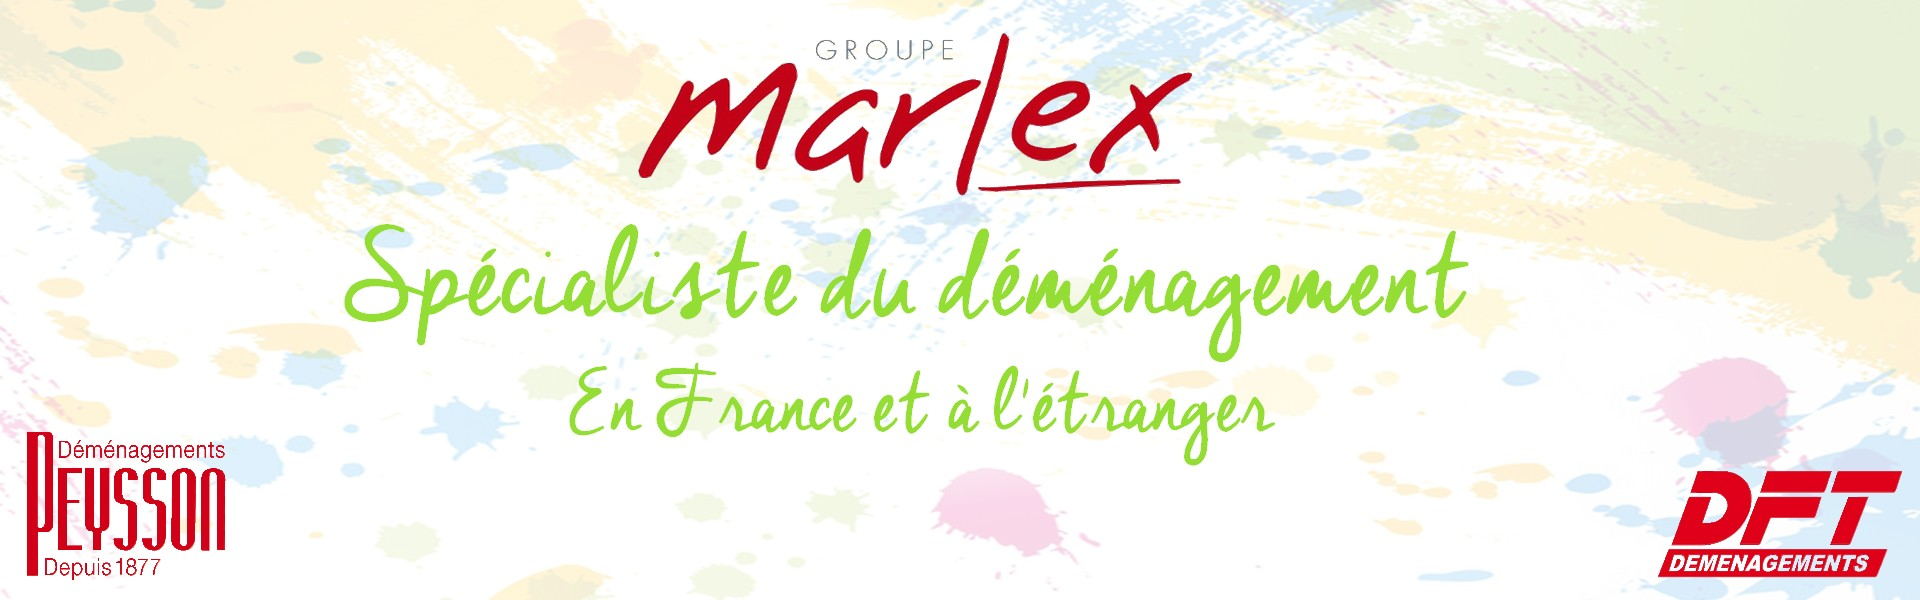 Groupe Marlex